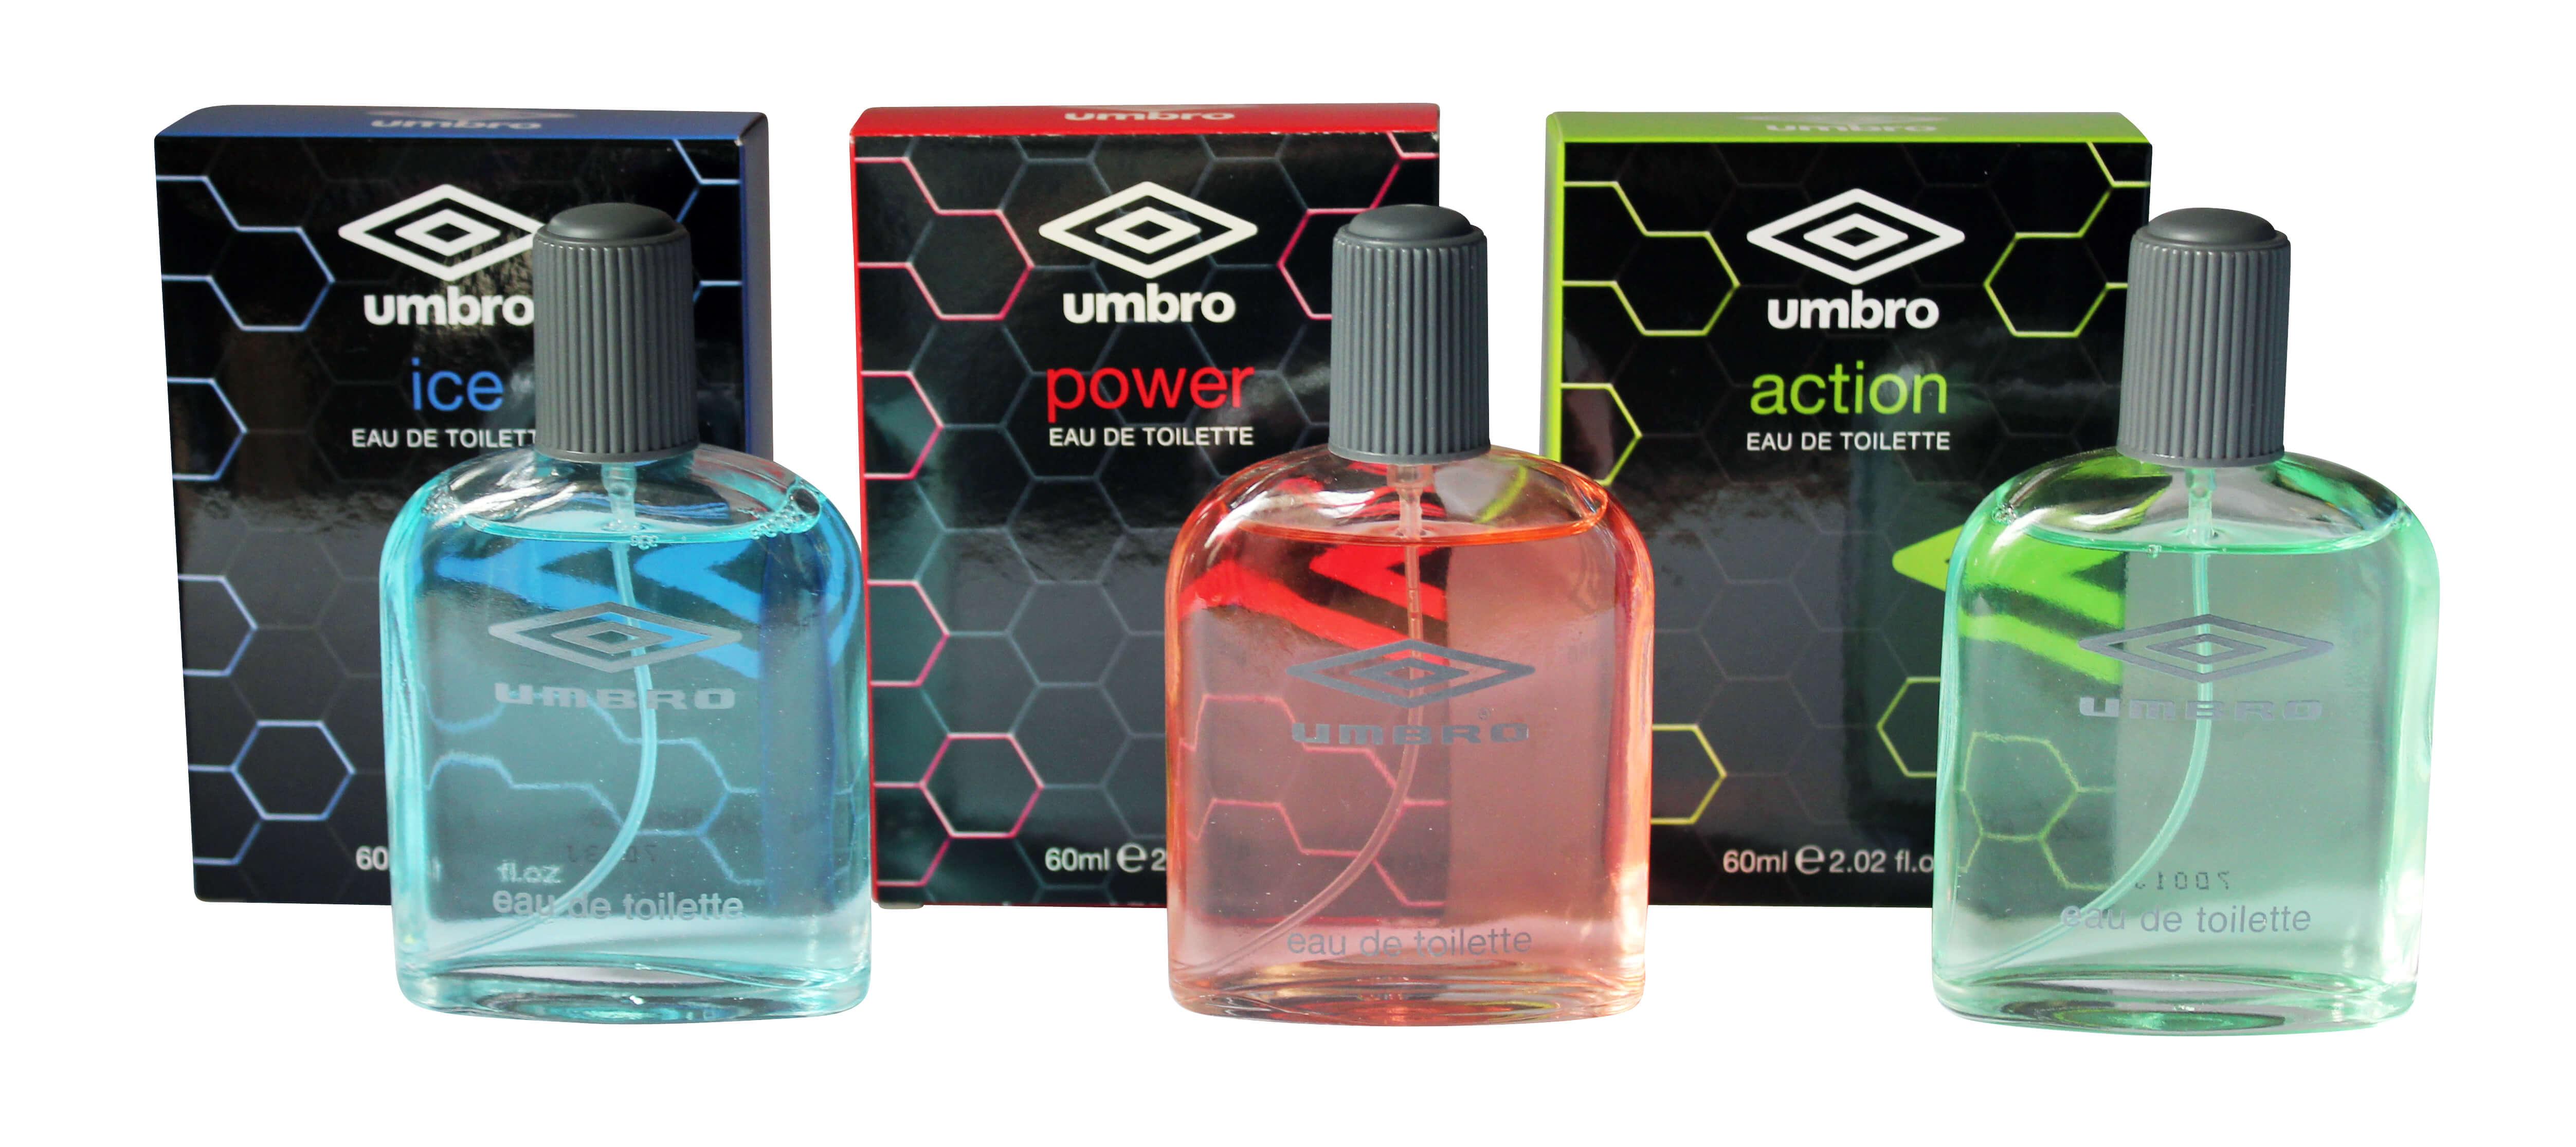 adb3bfce54b Umbro 3x60ml Eau De Toilette Aftershave Collection for Men: Ice + Power +  Action